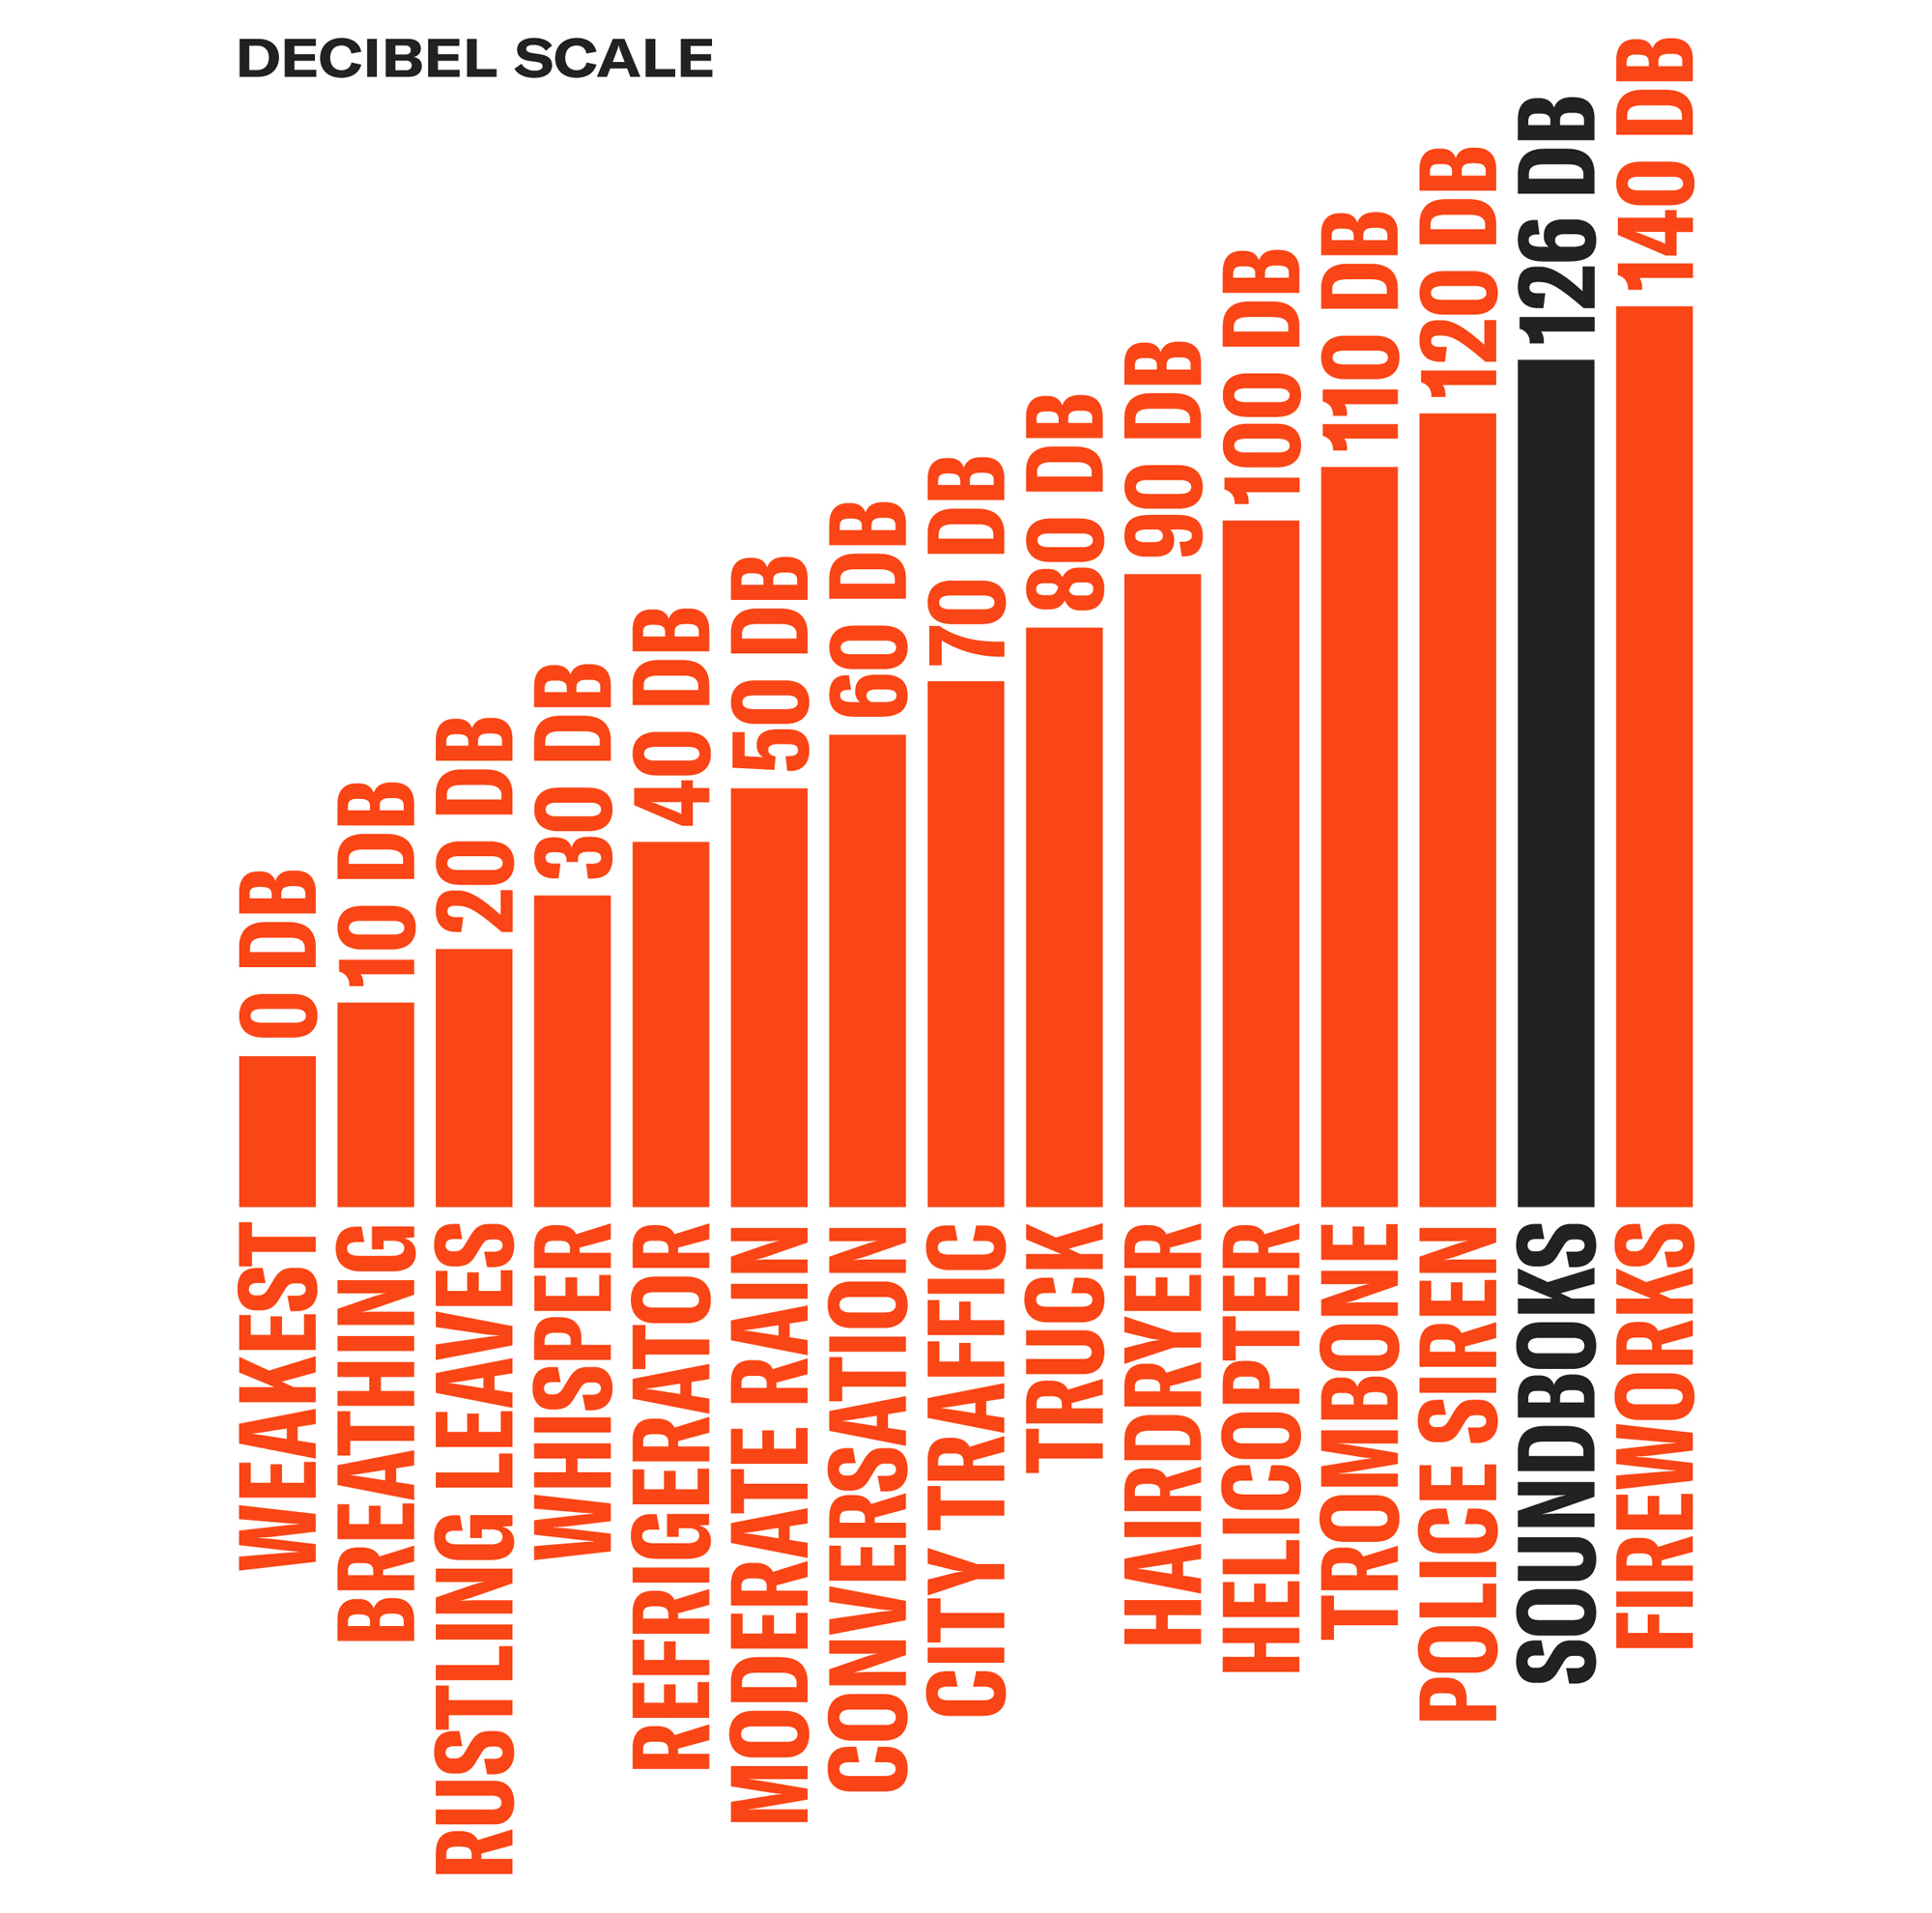 SOUNDBOKS decibel scale